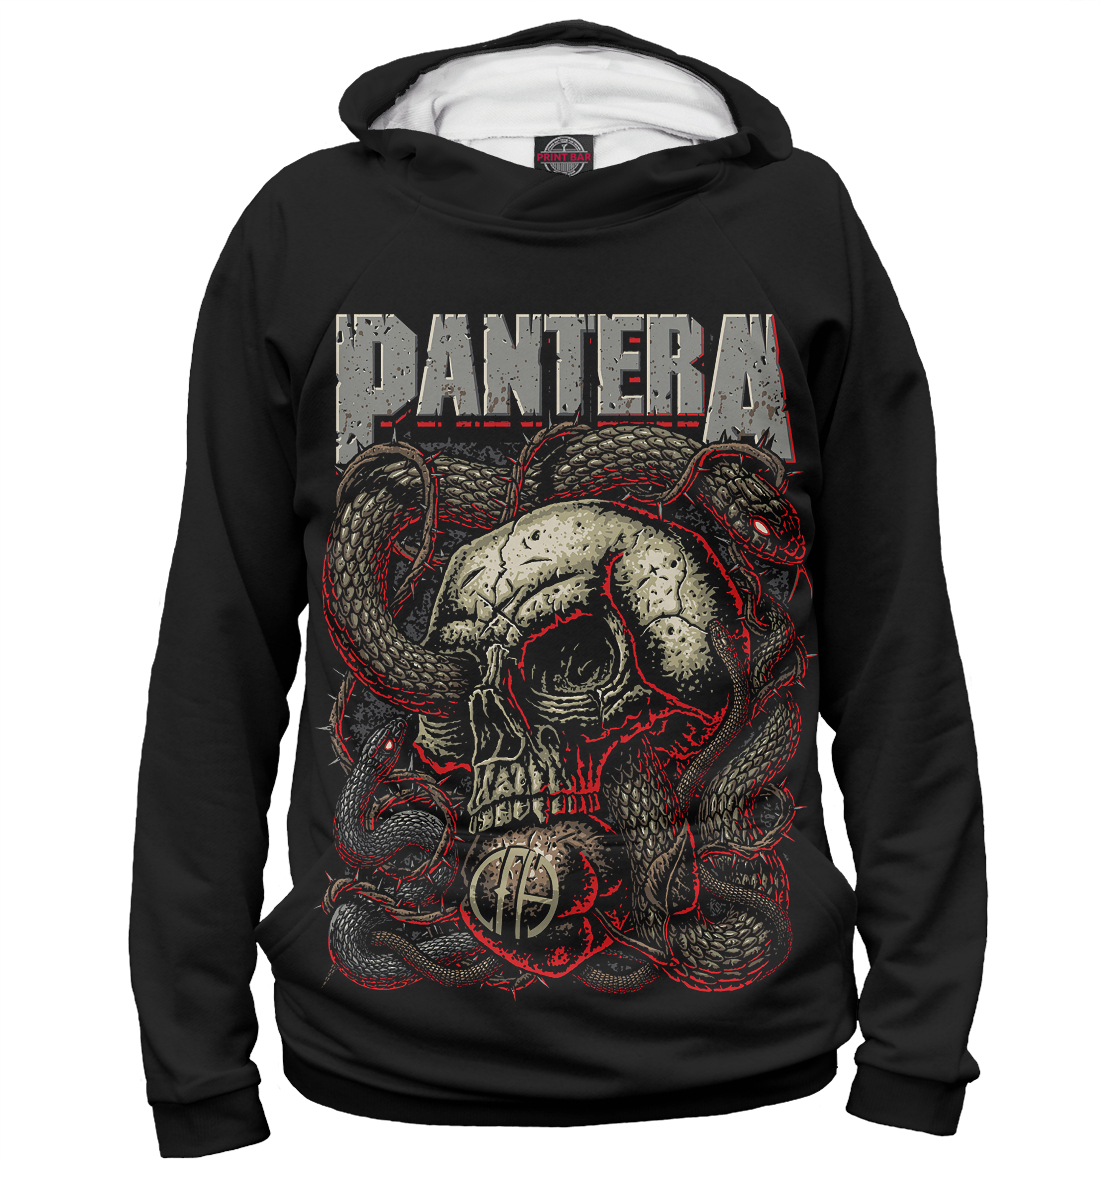 Купить Pantera Skull and Snake, Printbar, Худи, PNT-503328-hud-1